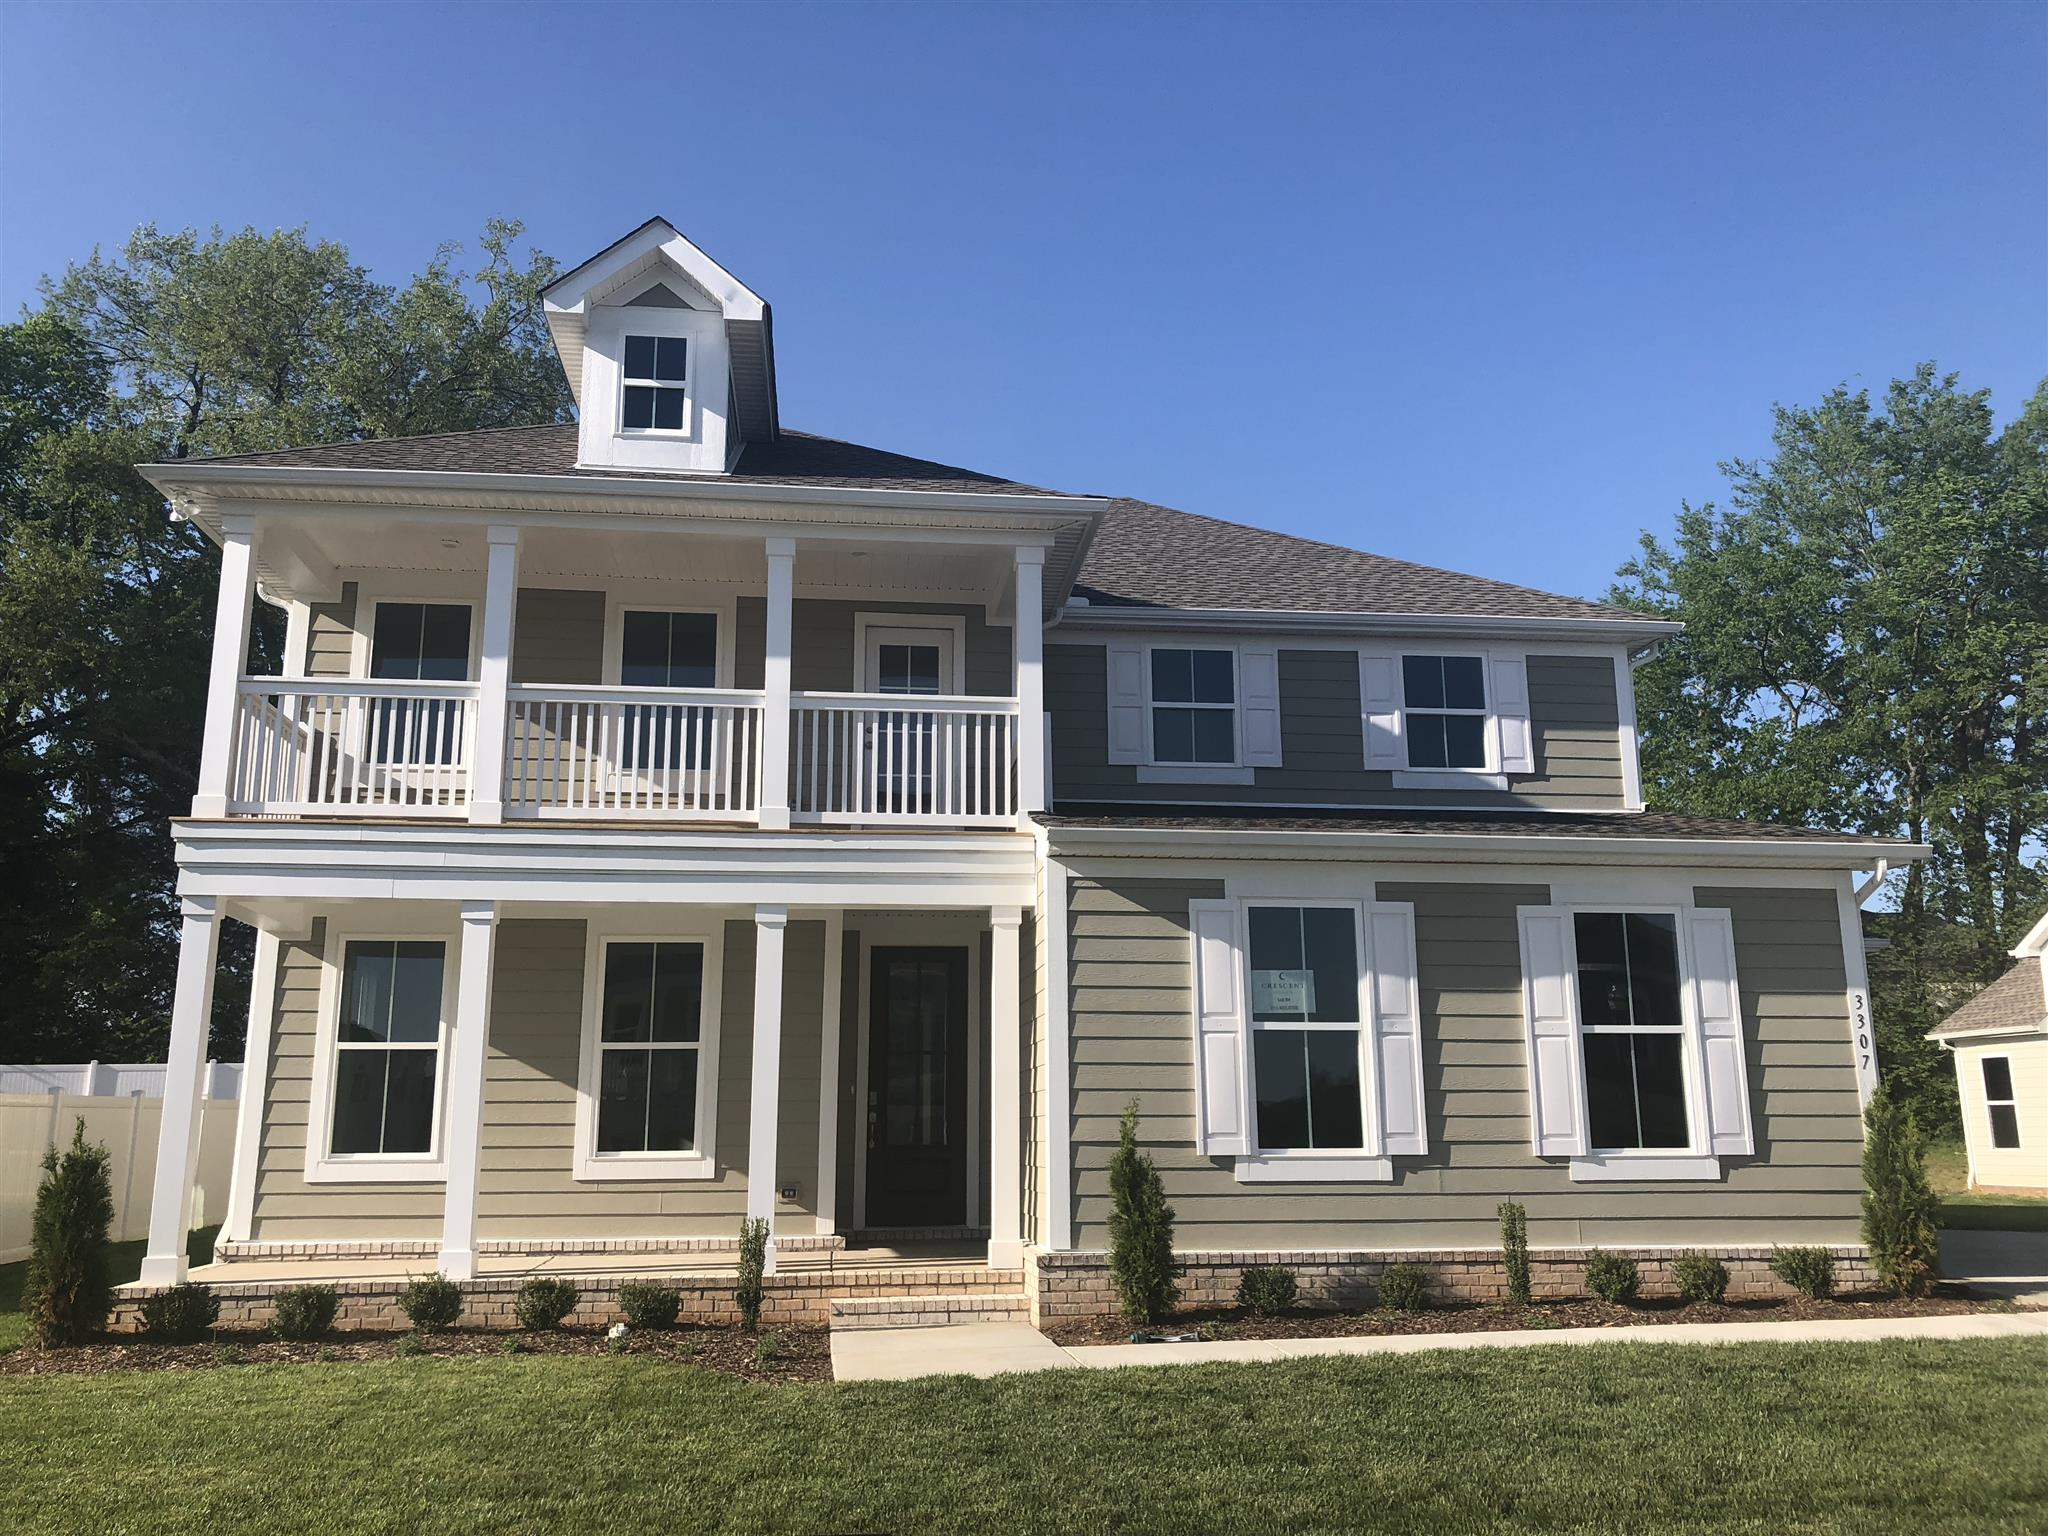 3307 Chinoe Drive- LOT 84, Murfreesboro, TN 37129 - Murfreesboro, TN real estate listing